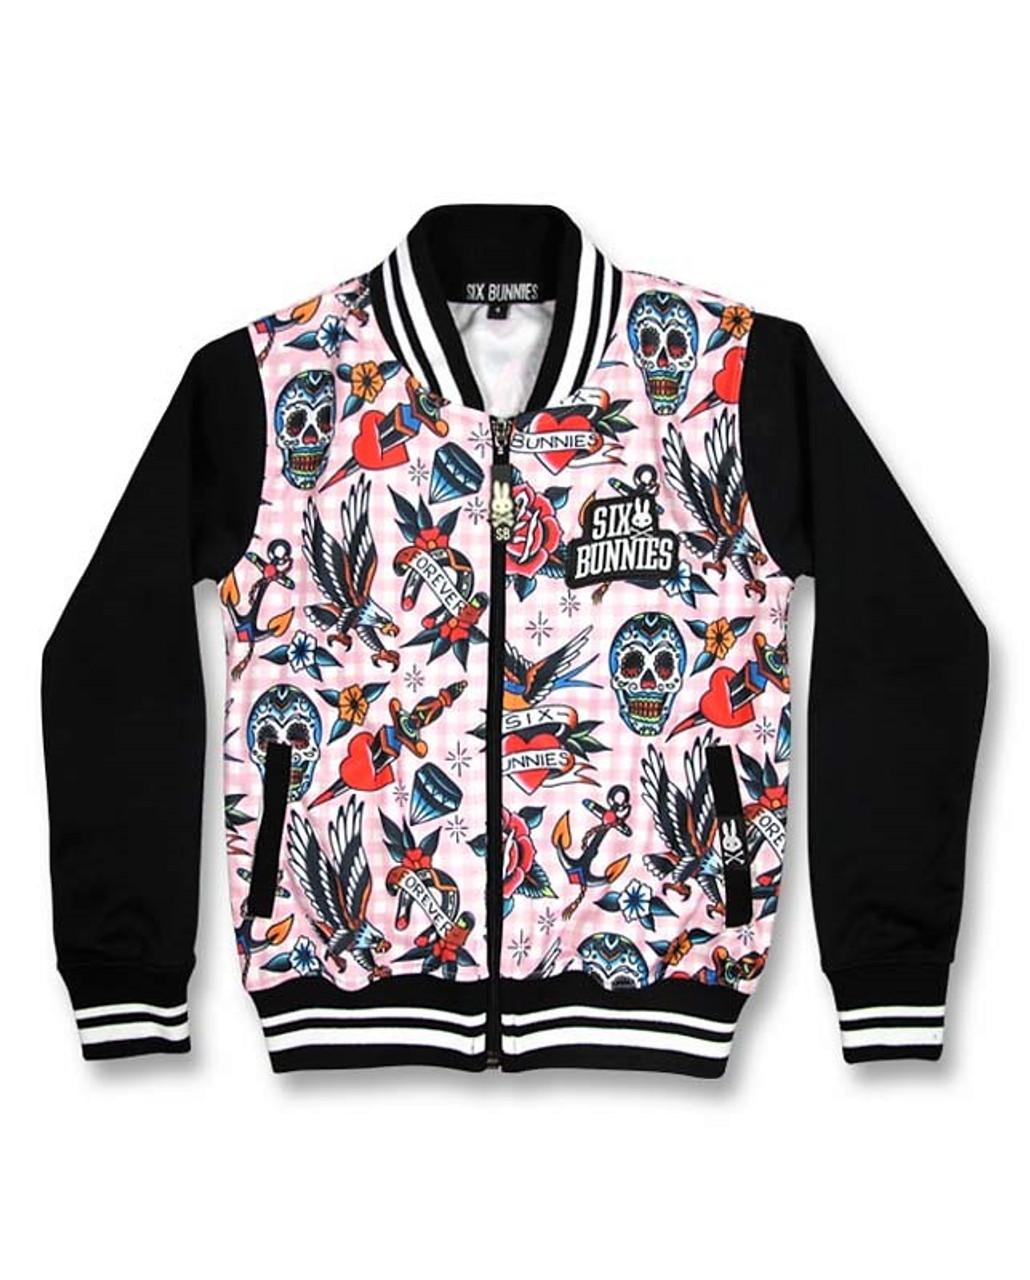 Six Bunnies Tattoo Shoppe Pink Jacket   Kids Bomber